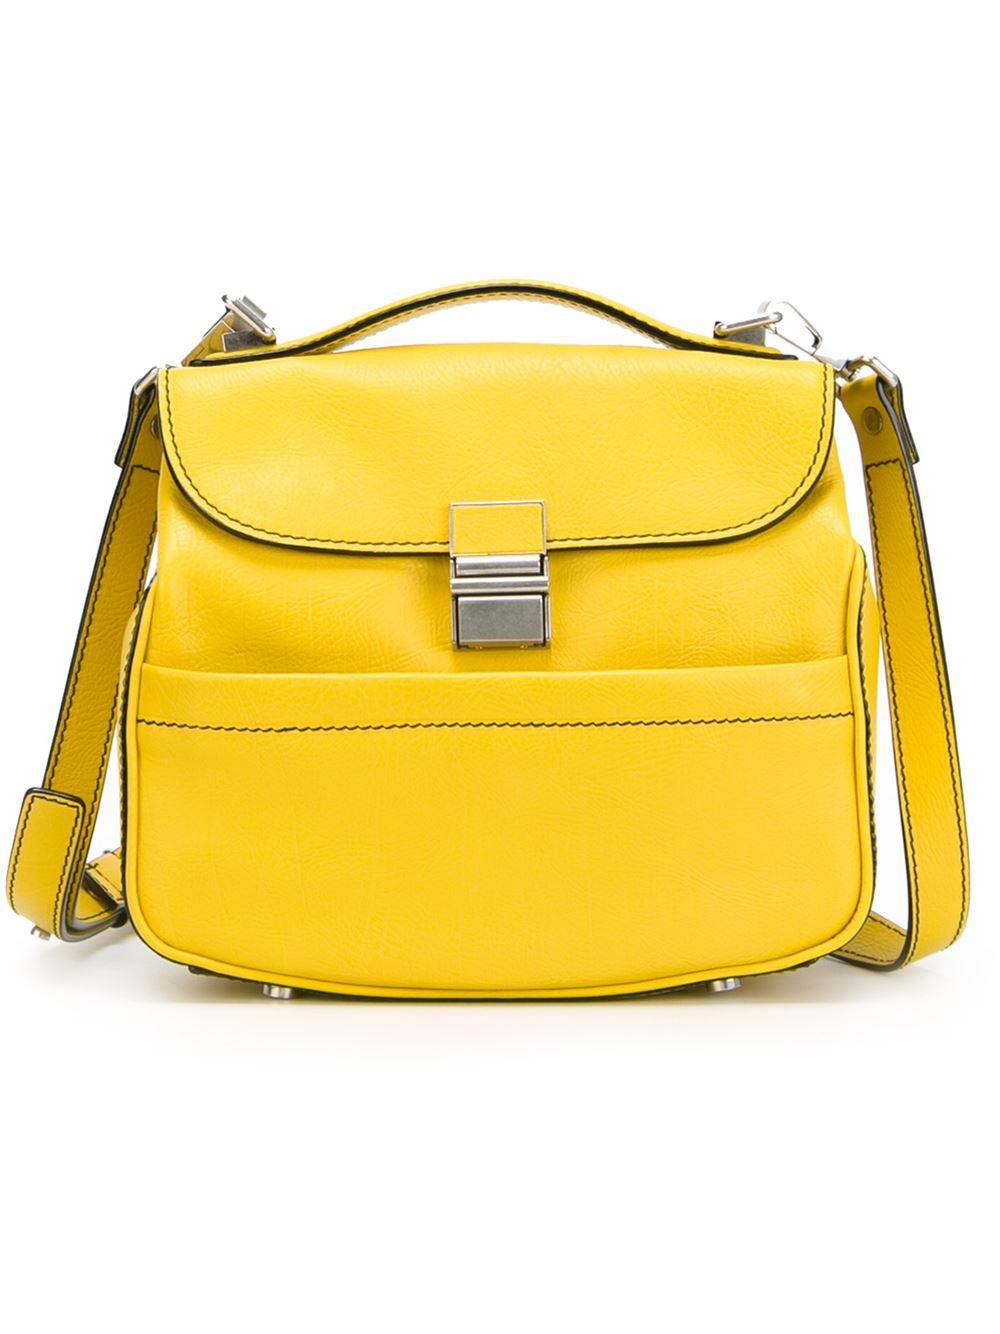 proenza schouler mini kent crossbody bag in yellow